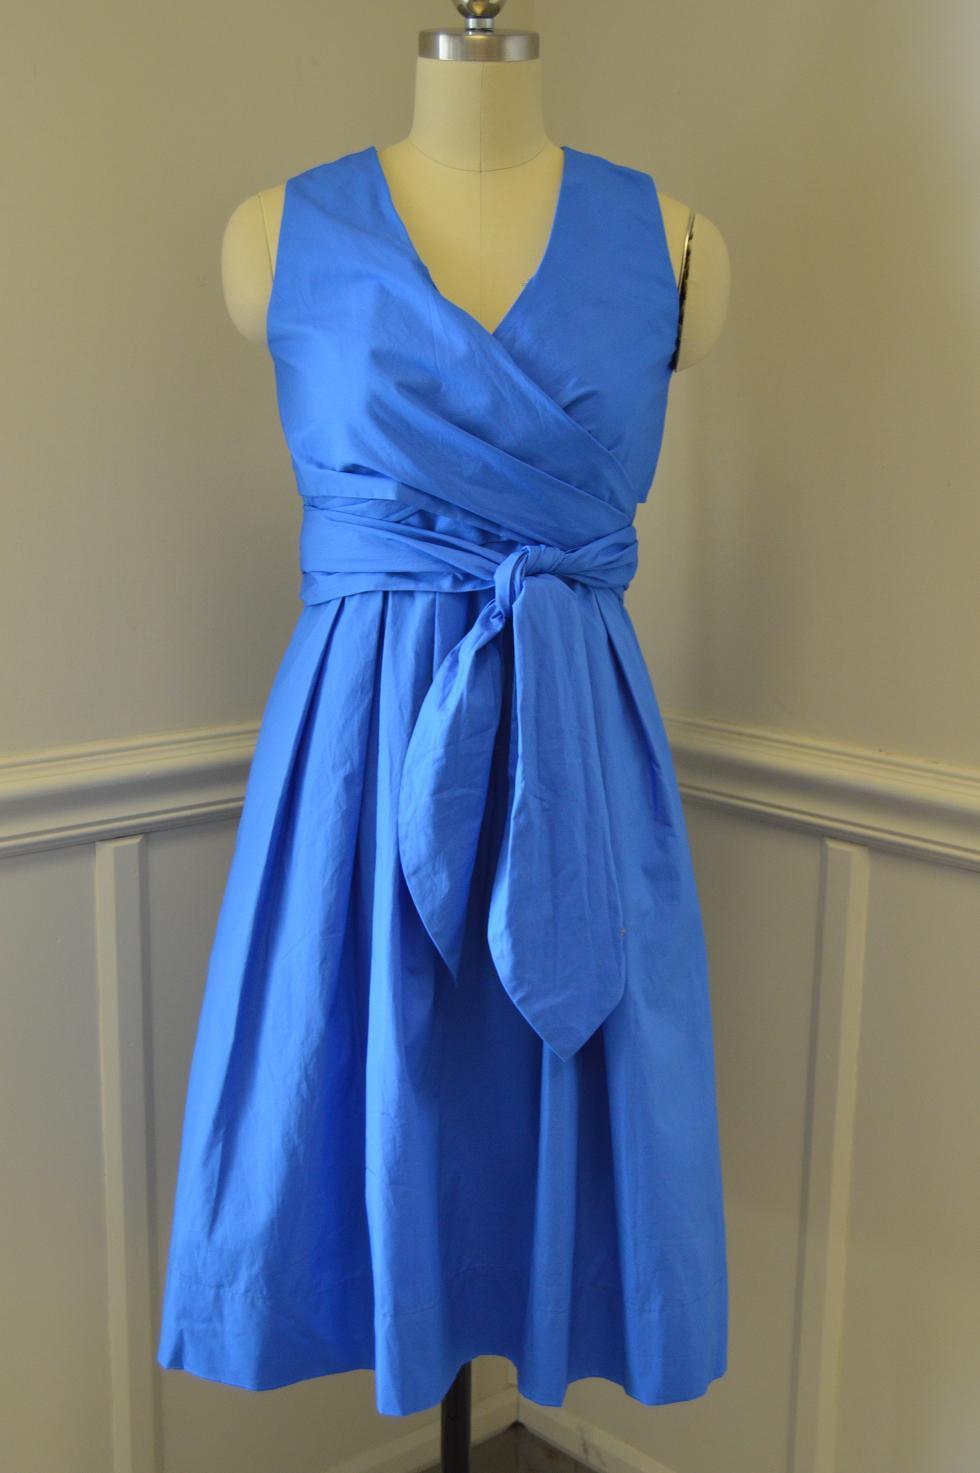 27eedb60c23 NEW JCrew  138 Wrap Dress in Cotton Poplin Size 2 Sundrenched Pool ...